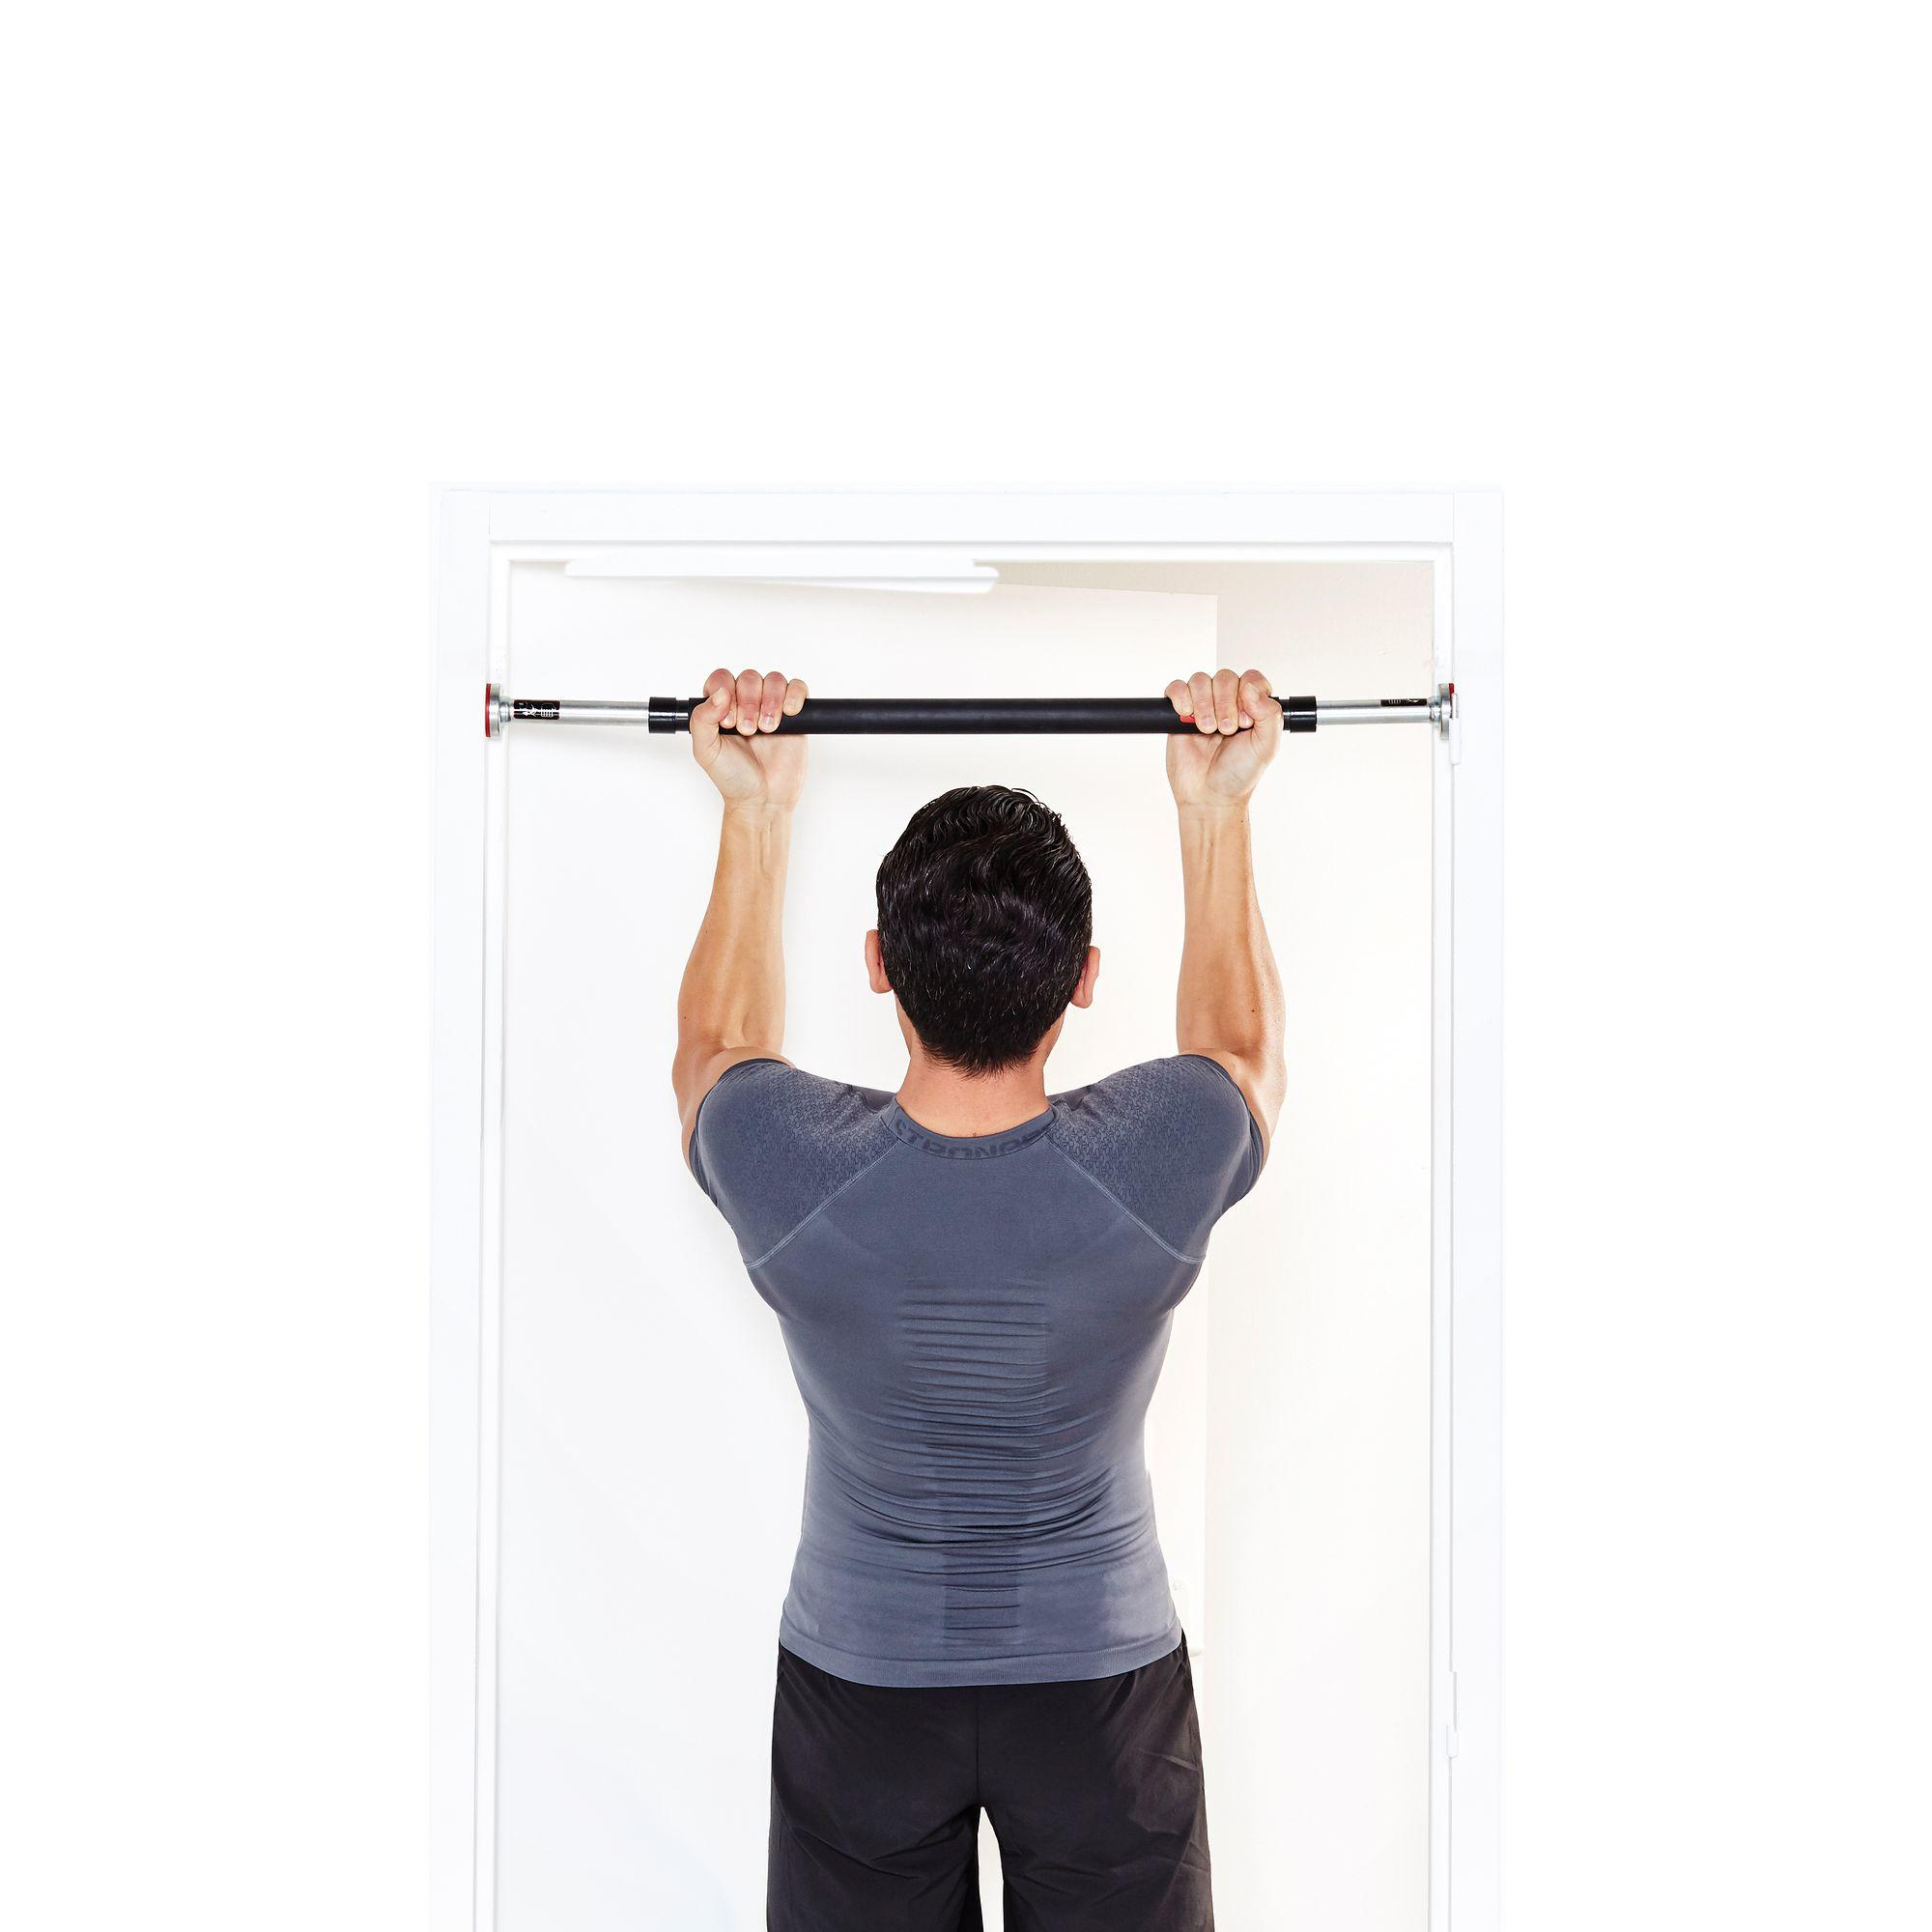 Calisthenics Exercises - 10 Best Calisthenics Workouts To Build Muscle - Decathlon